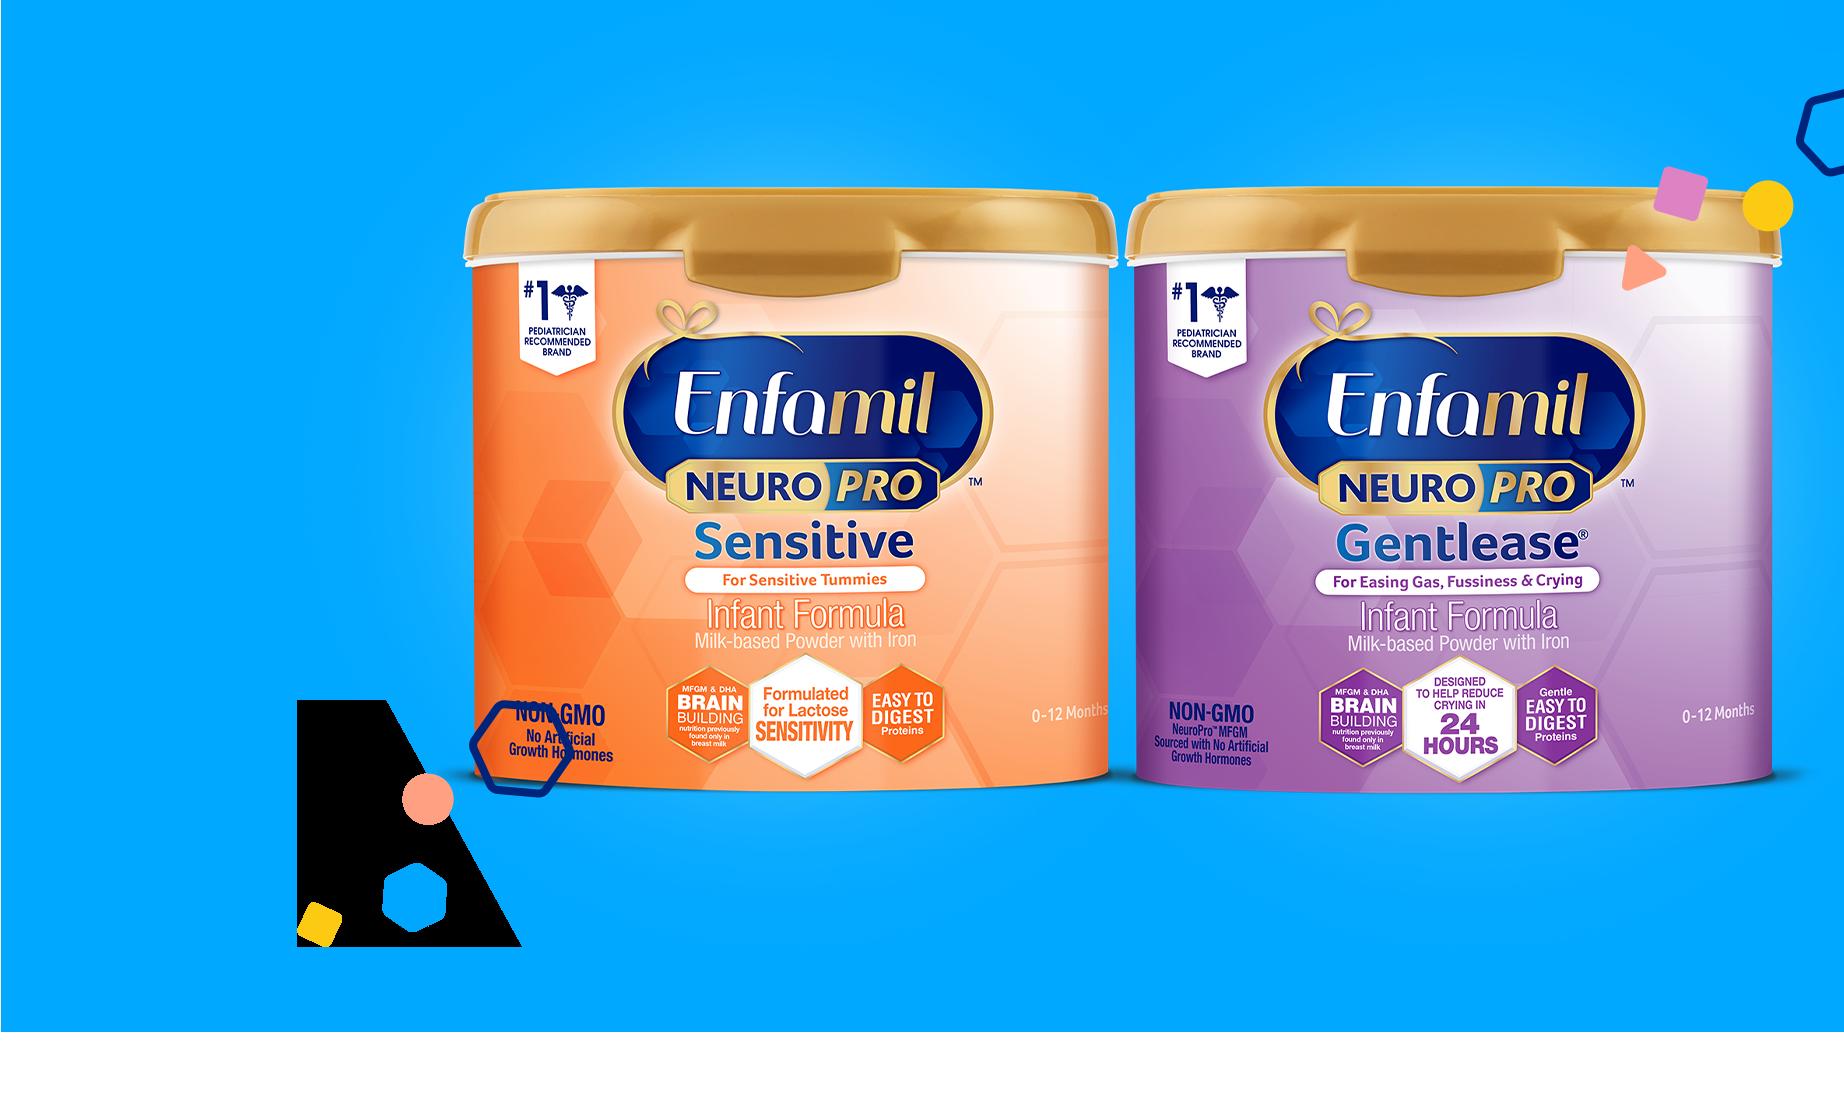 Enfamil Sensitive vs. Enfamil Gentlease Formulas